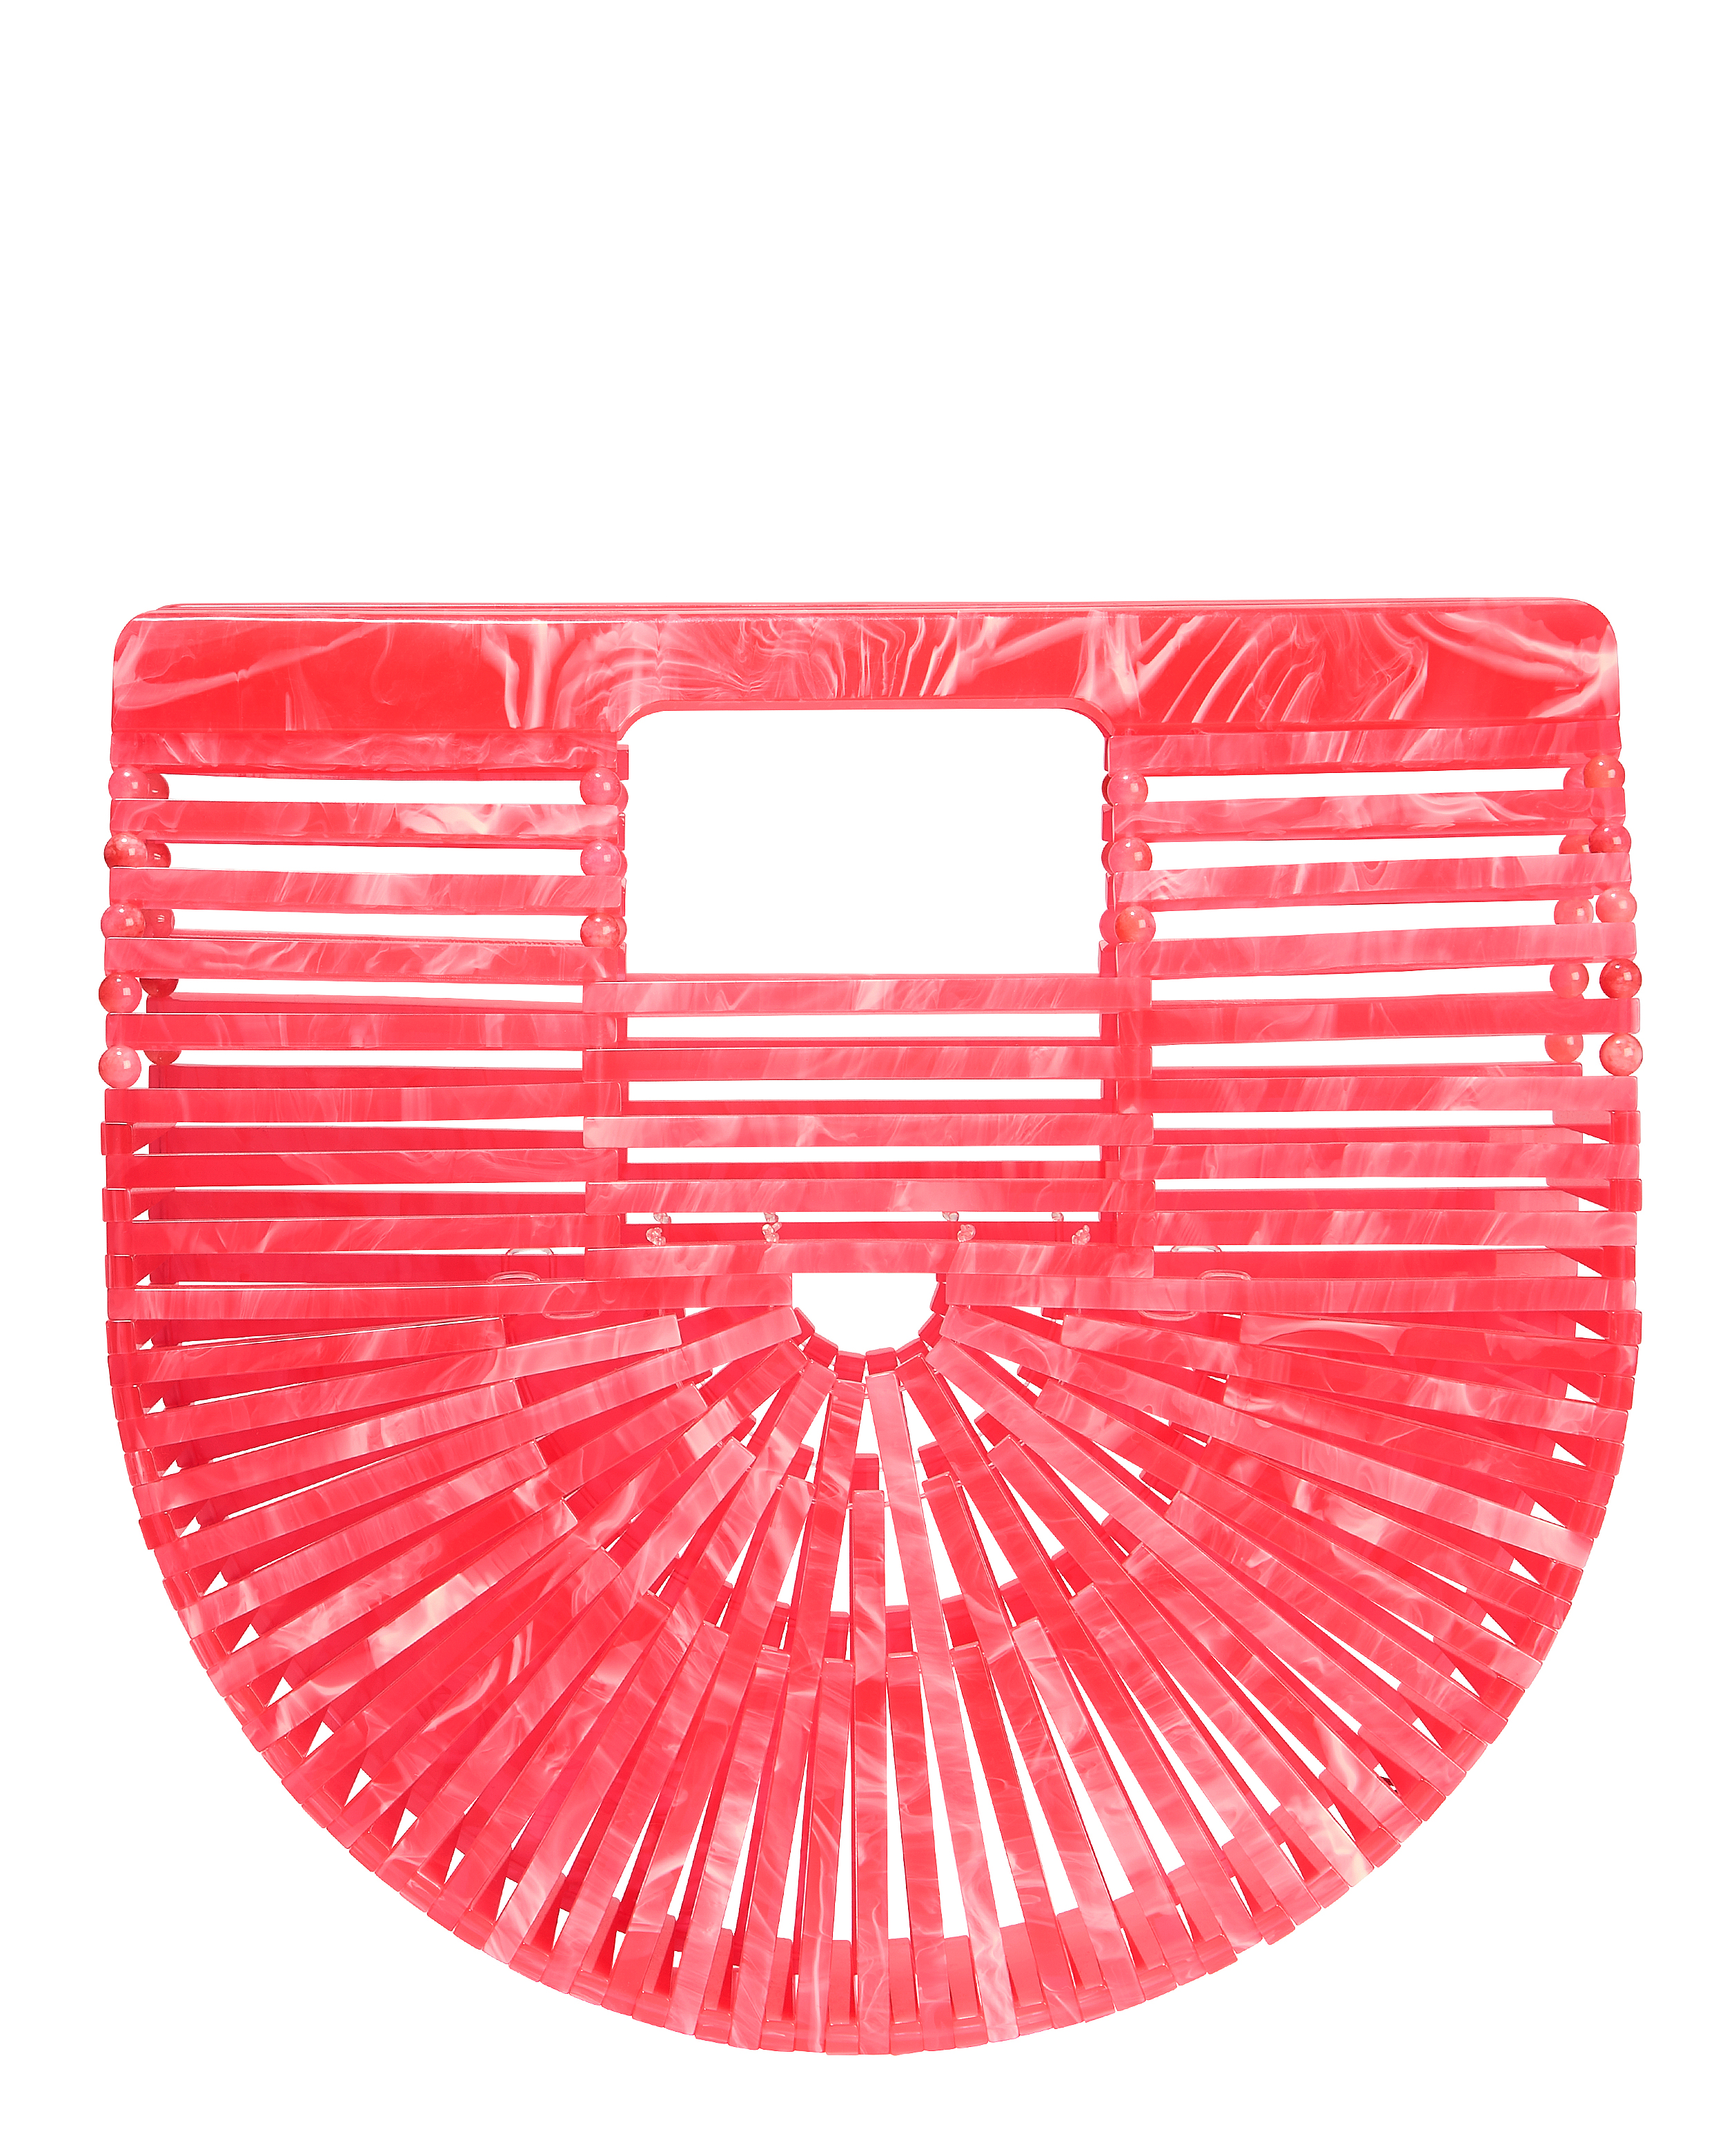 Mini Ark Handbag - Coral, Watermelon